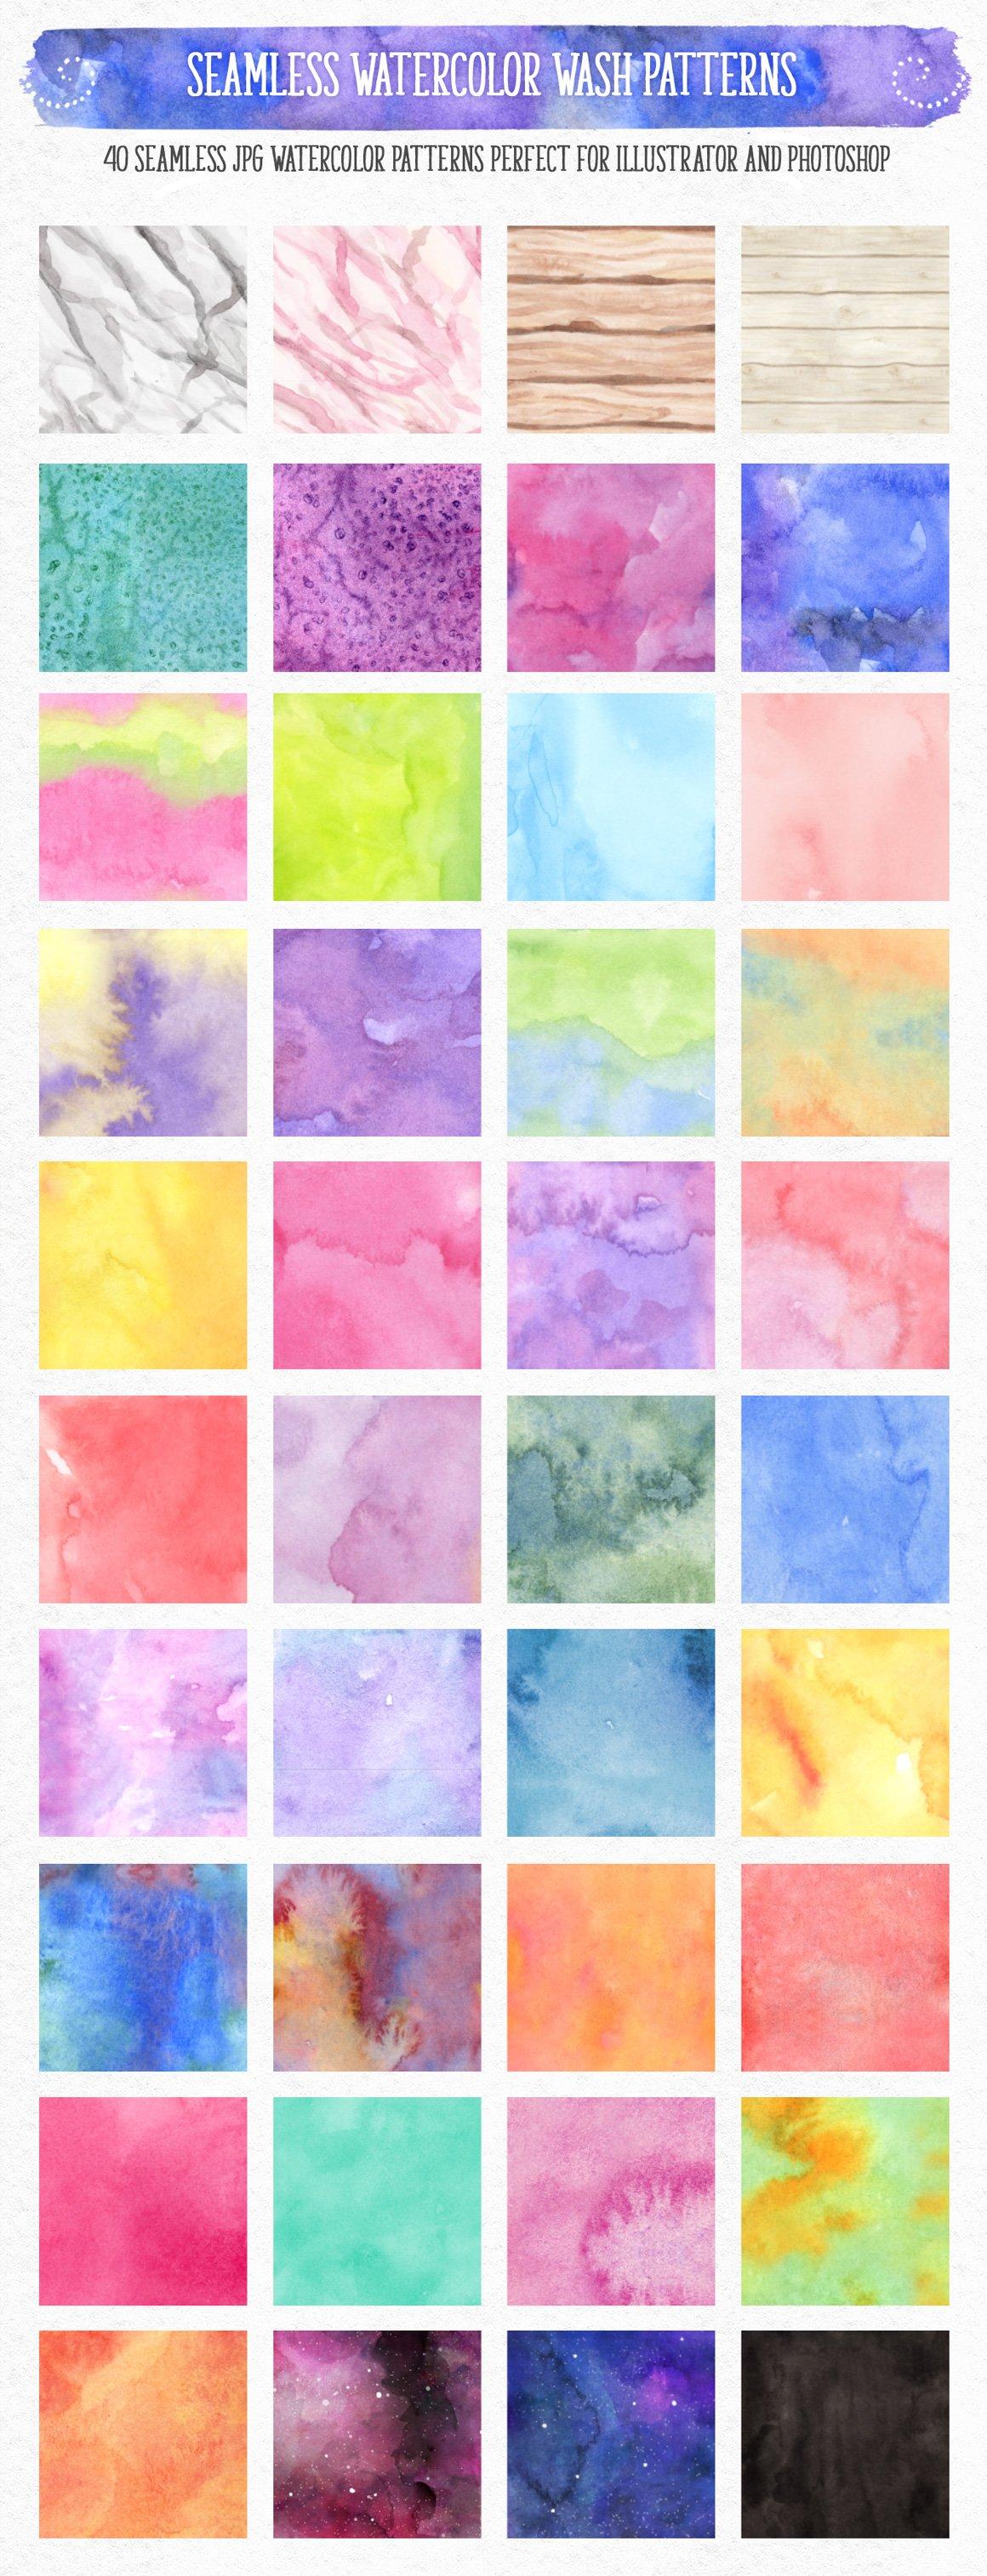 700多个木材大理石空间水彩纹理工具包 New Watercolor Texture Toolkit插图(10)